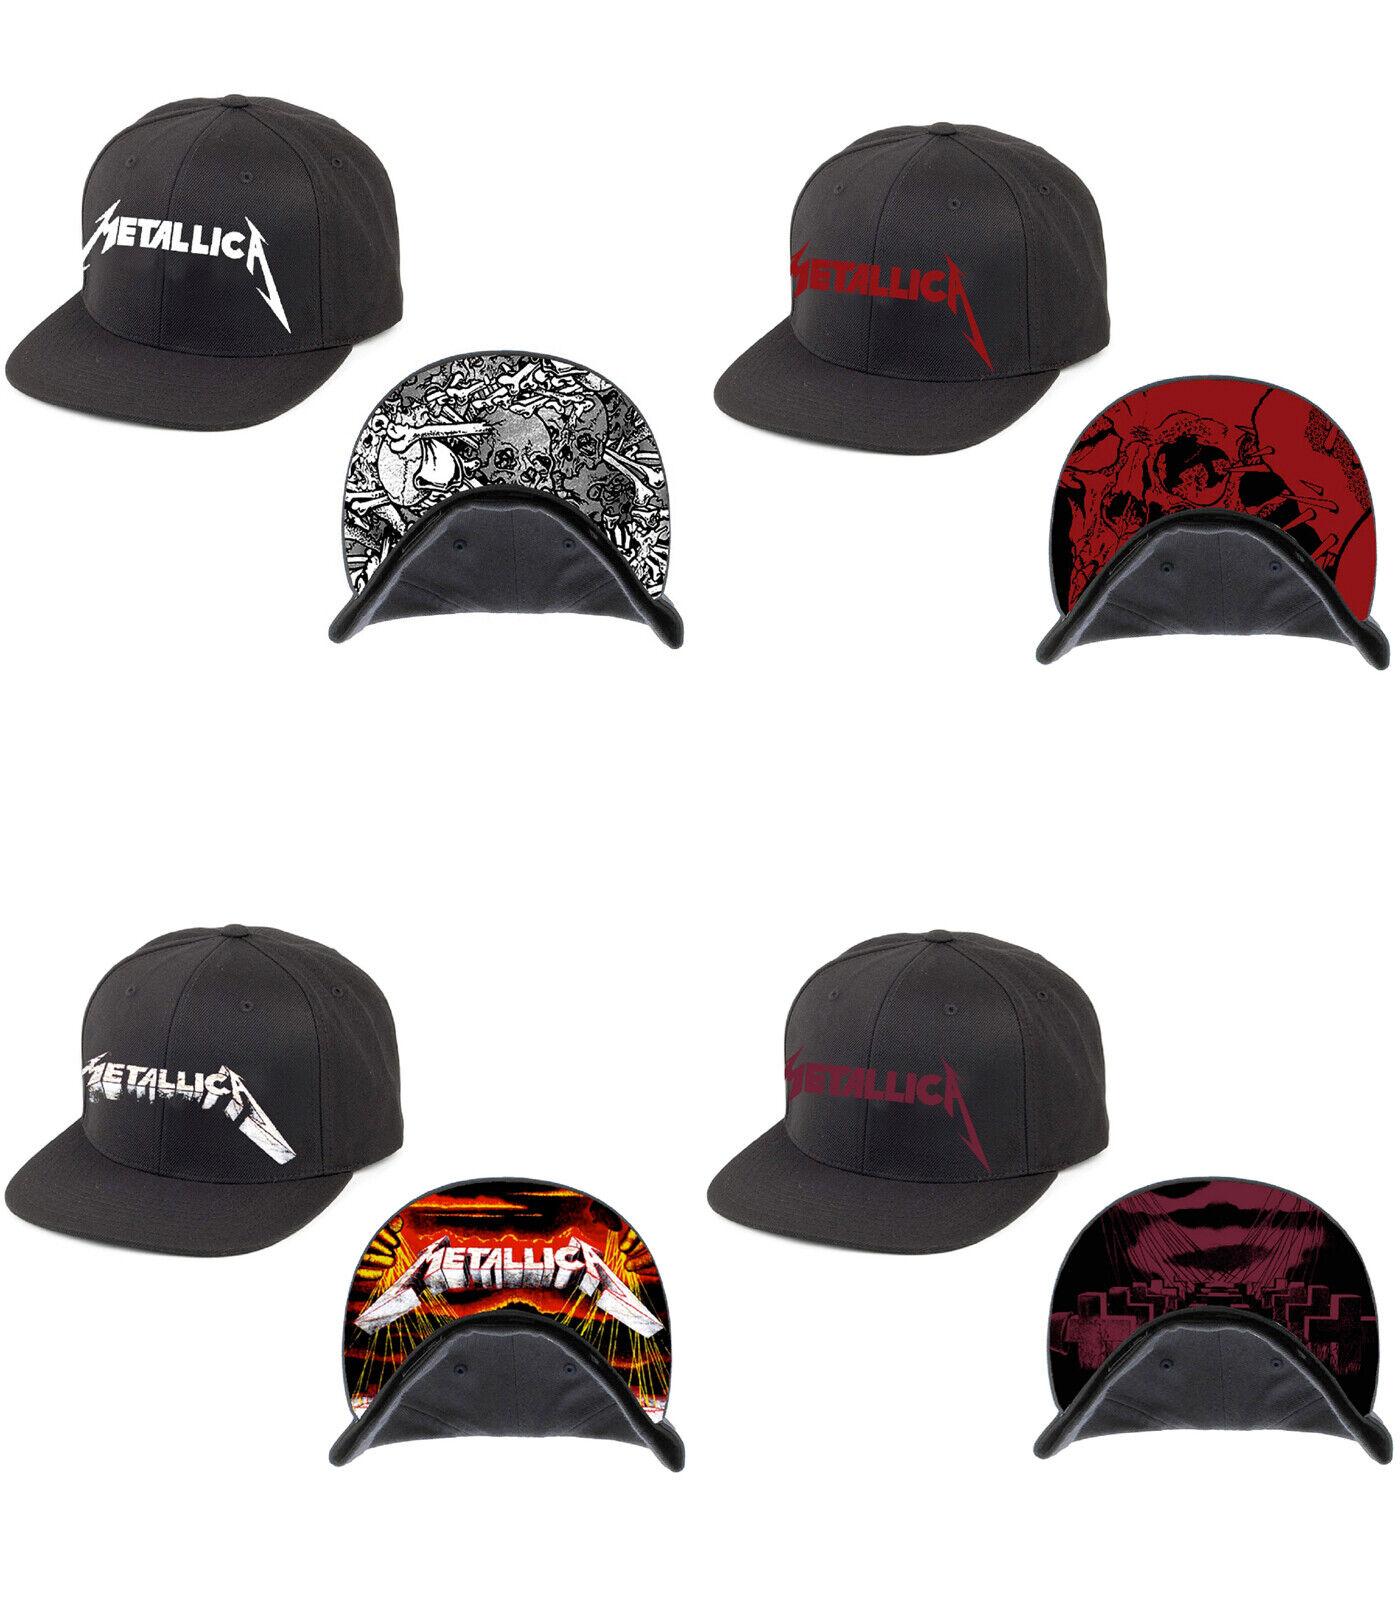 Garage Days Re Black Baseball Cap Revisited Silver Logo Official Metallica